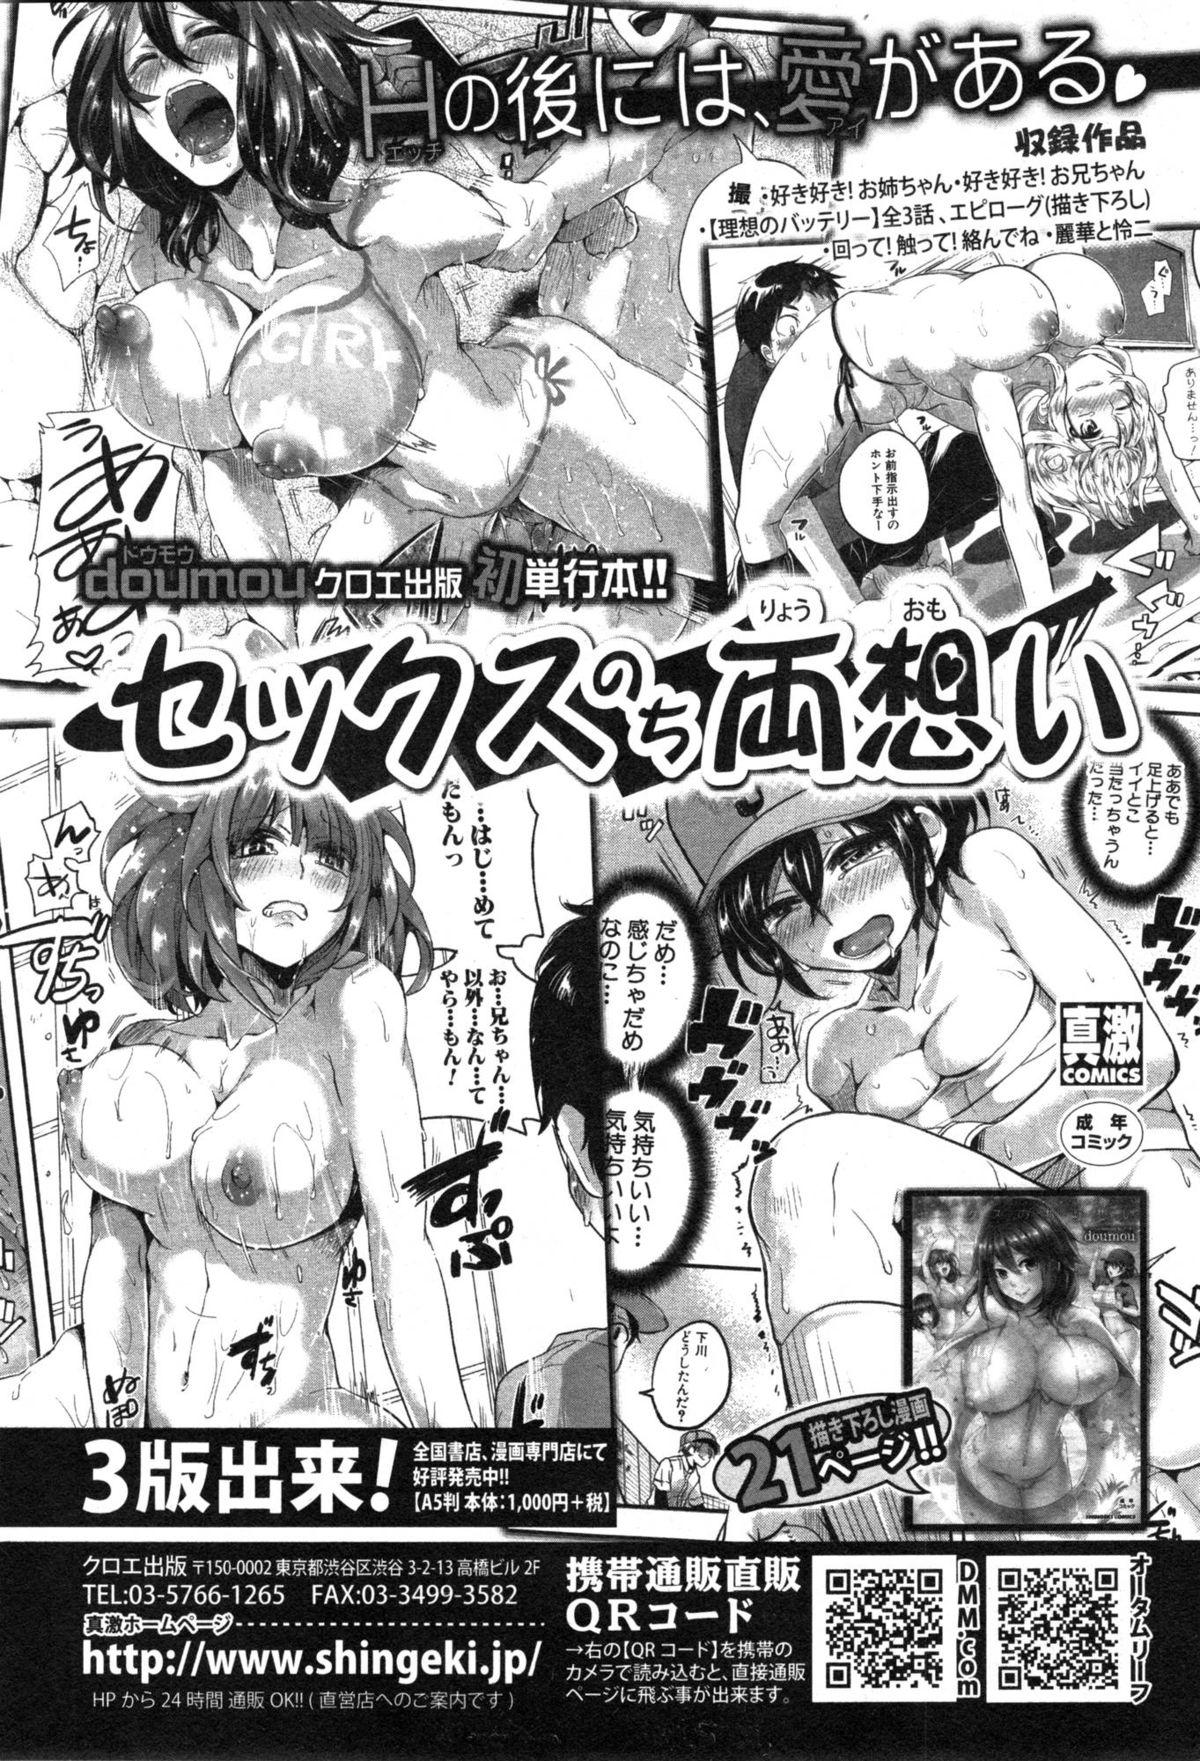 COMIC Shingeki 2015-01 36